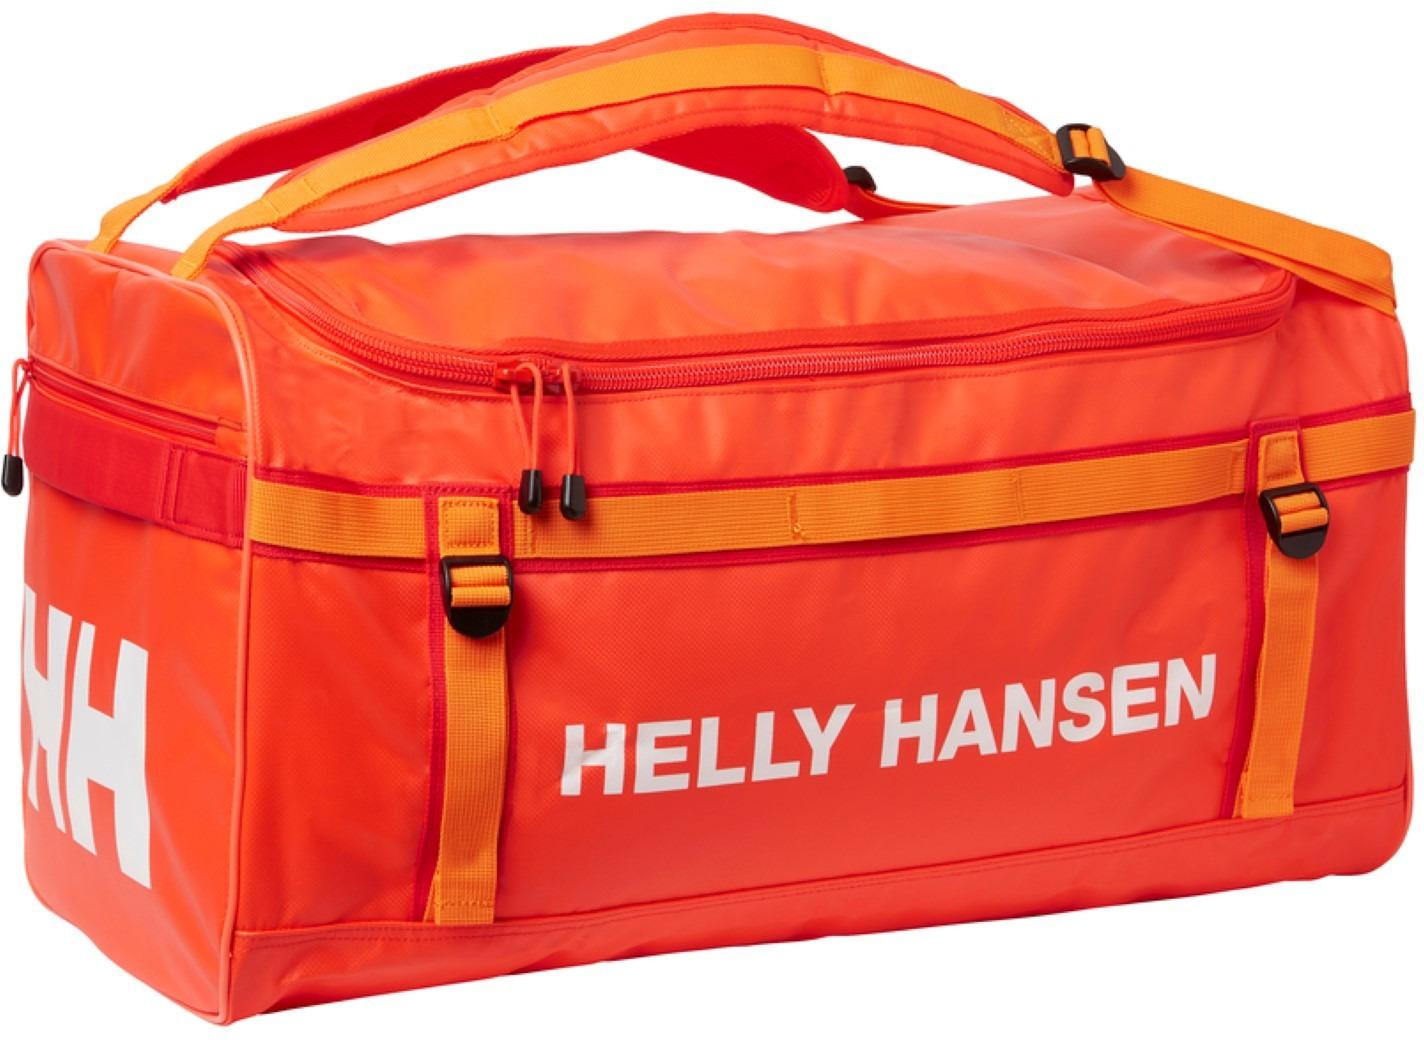 цена на Сумка Helly Hansen Hh Classic Duffel Bag, 67168_147, ярко-красный